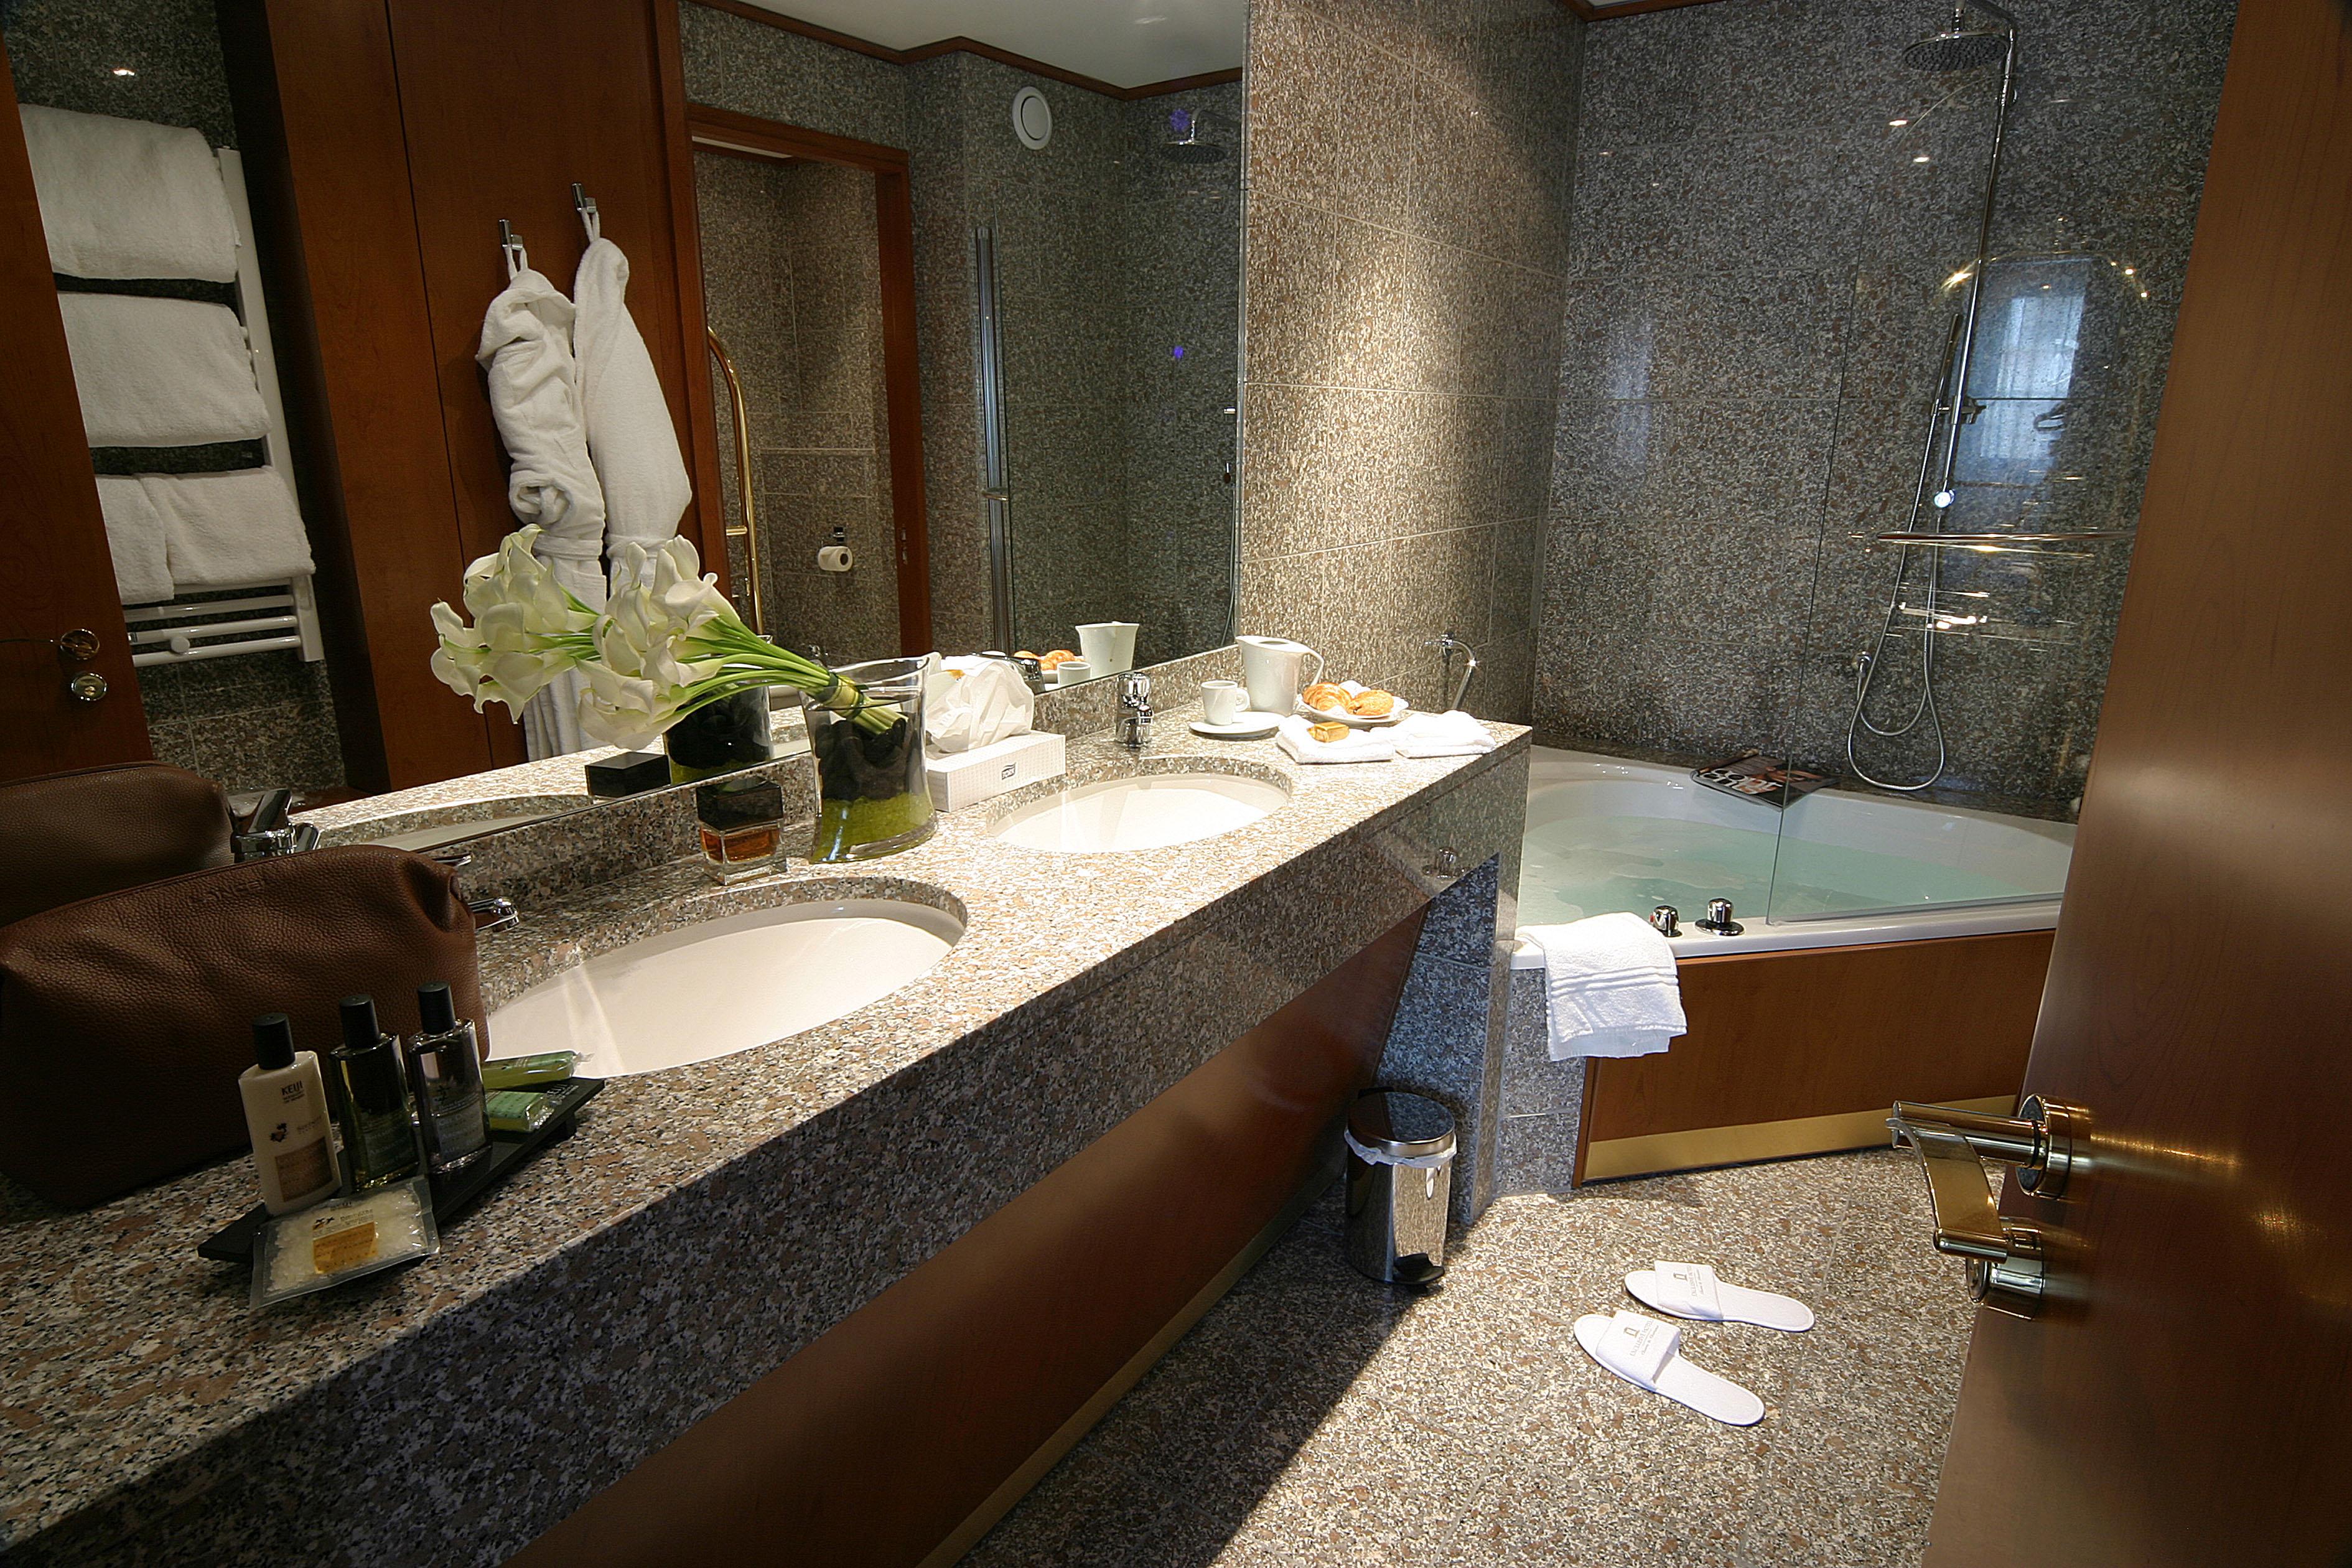 File salle de bains en granite hotel - Photo de salle de bain ...